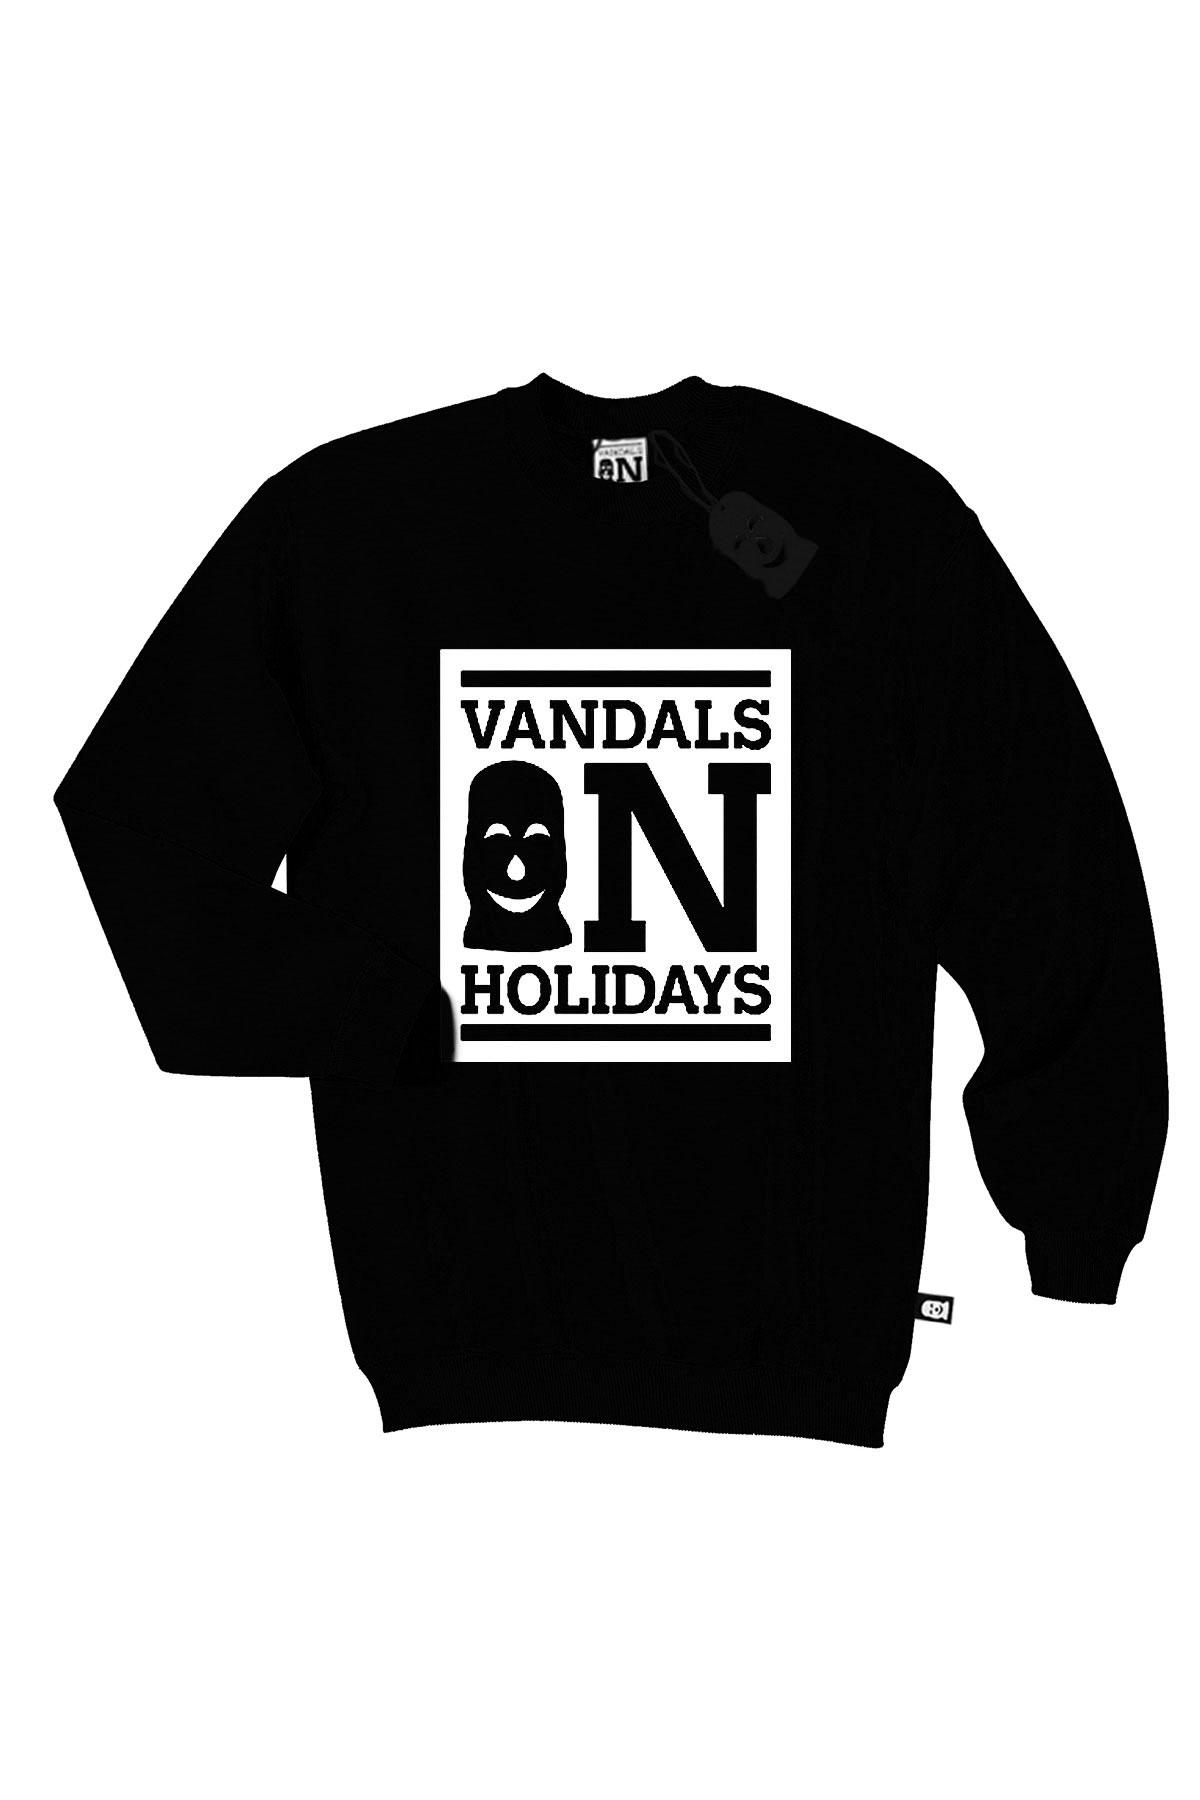 905e10849b Vandals On Holidays CLASSIC LOGO Felpa girocollo Nera